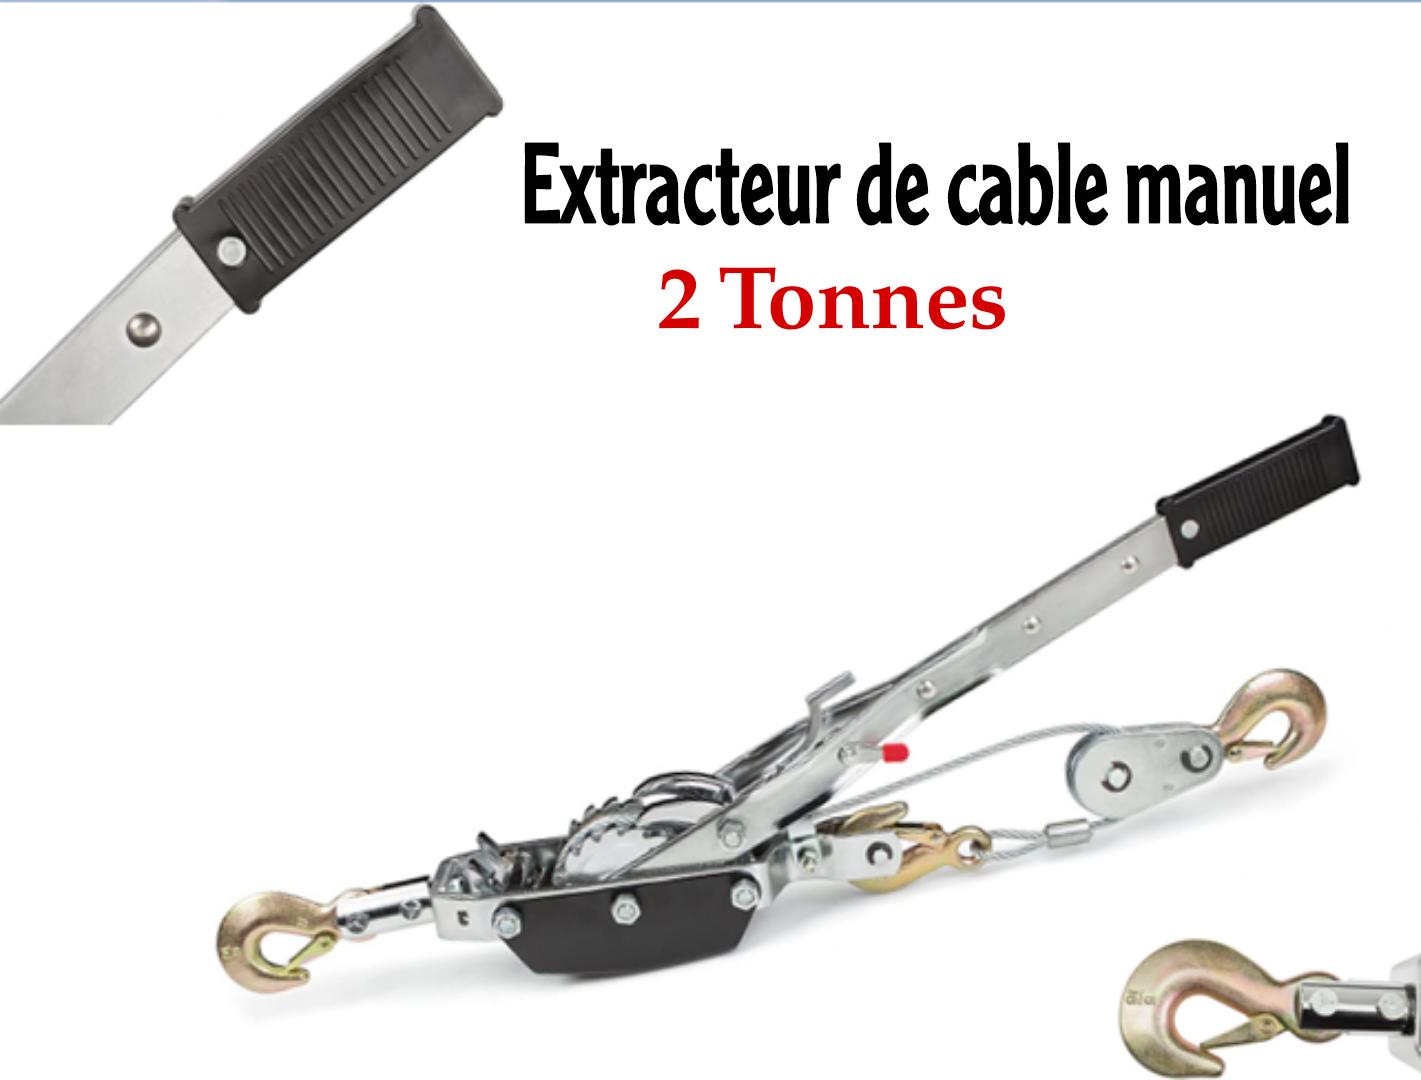 Extracteur de cable manuel